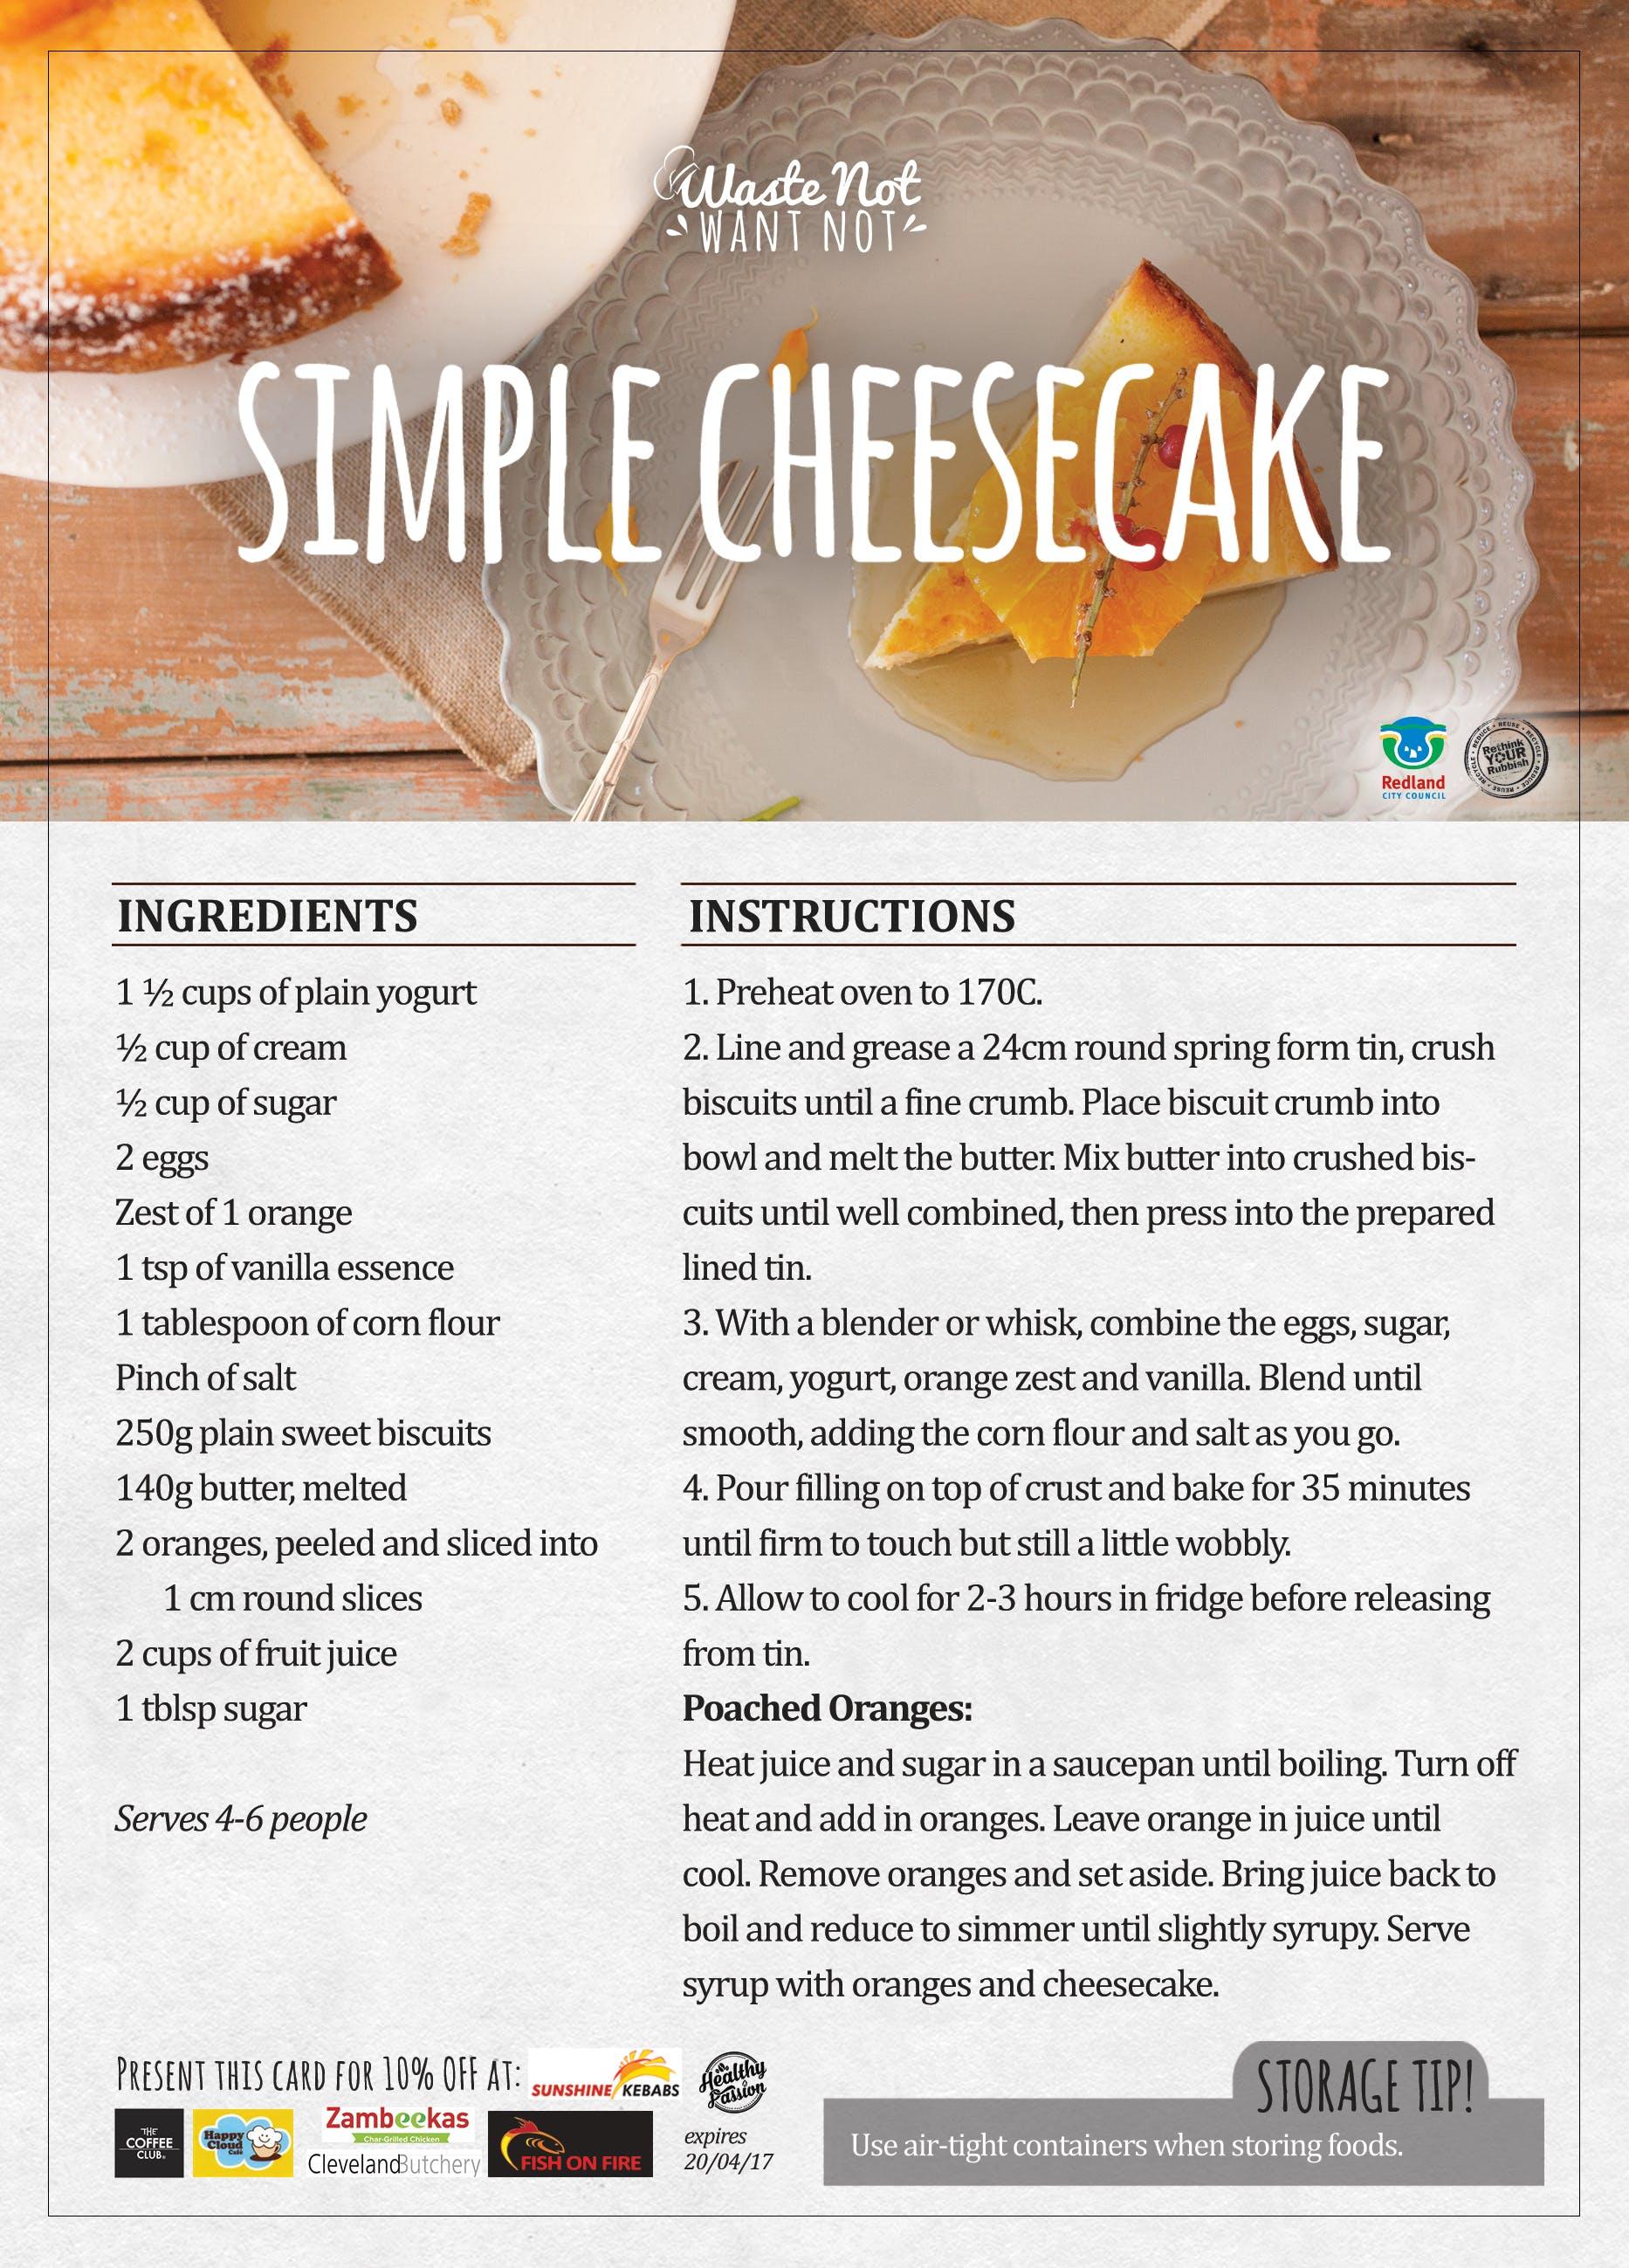 Simple cheesecake recipe card